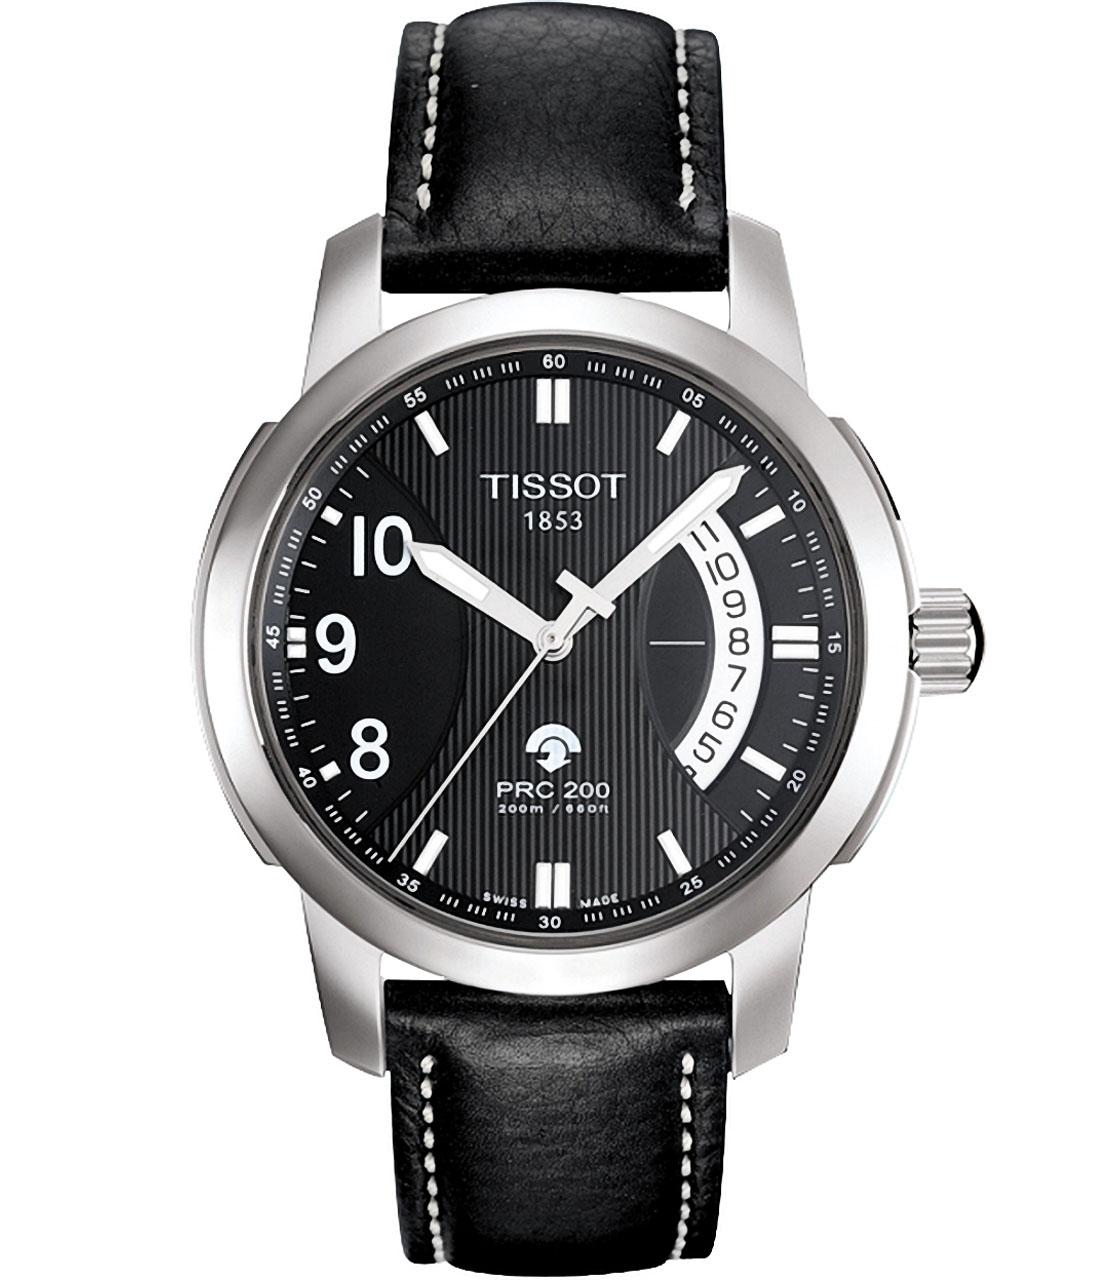 Đồng hồ Tissot PRC200 chronograph T014.421.16.057.00